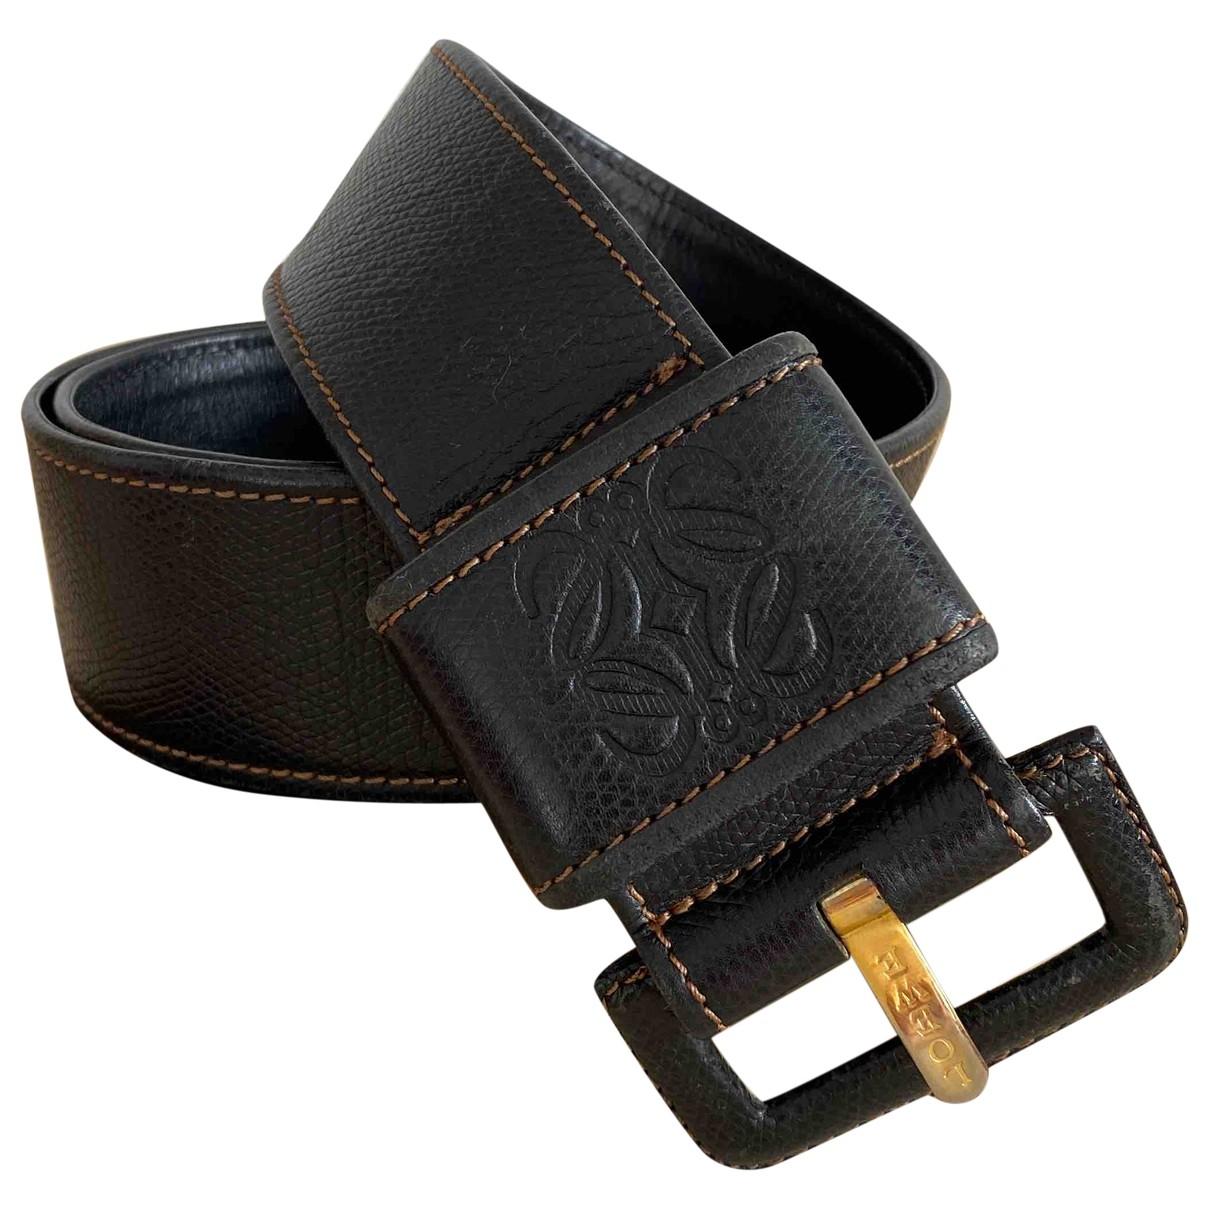 Loewe \N Navy Leather belt for Women S International